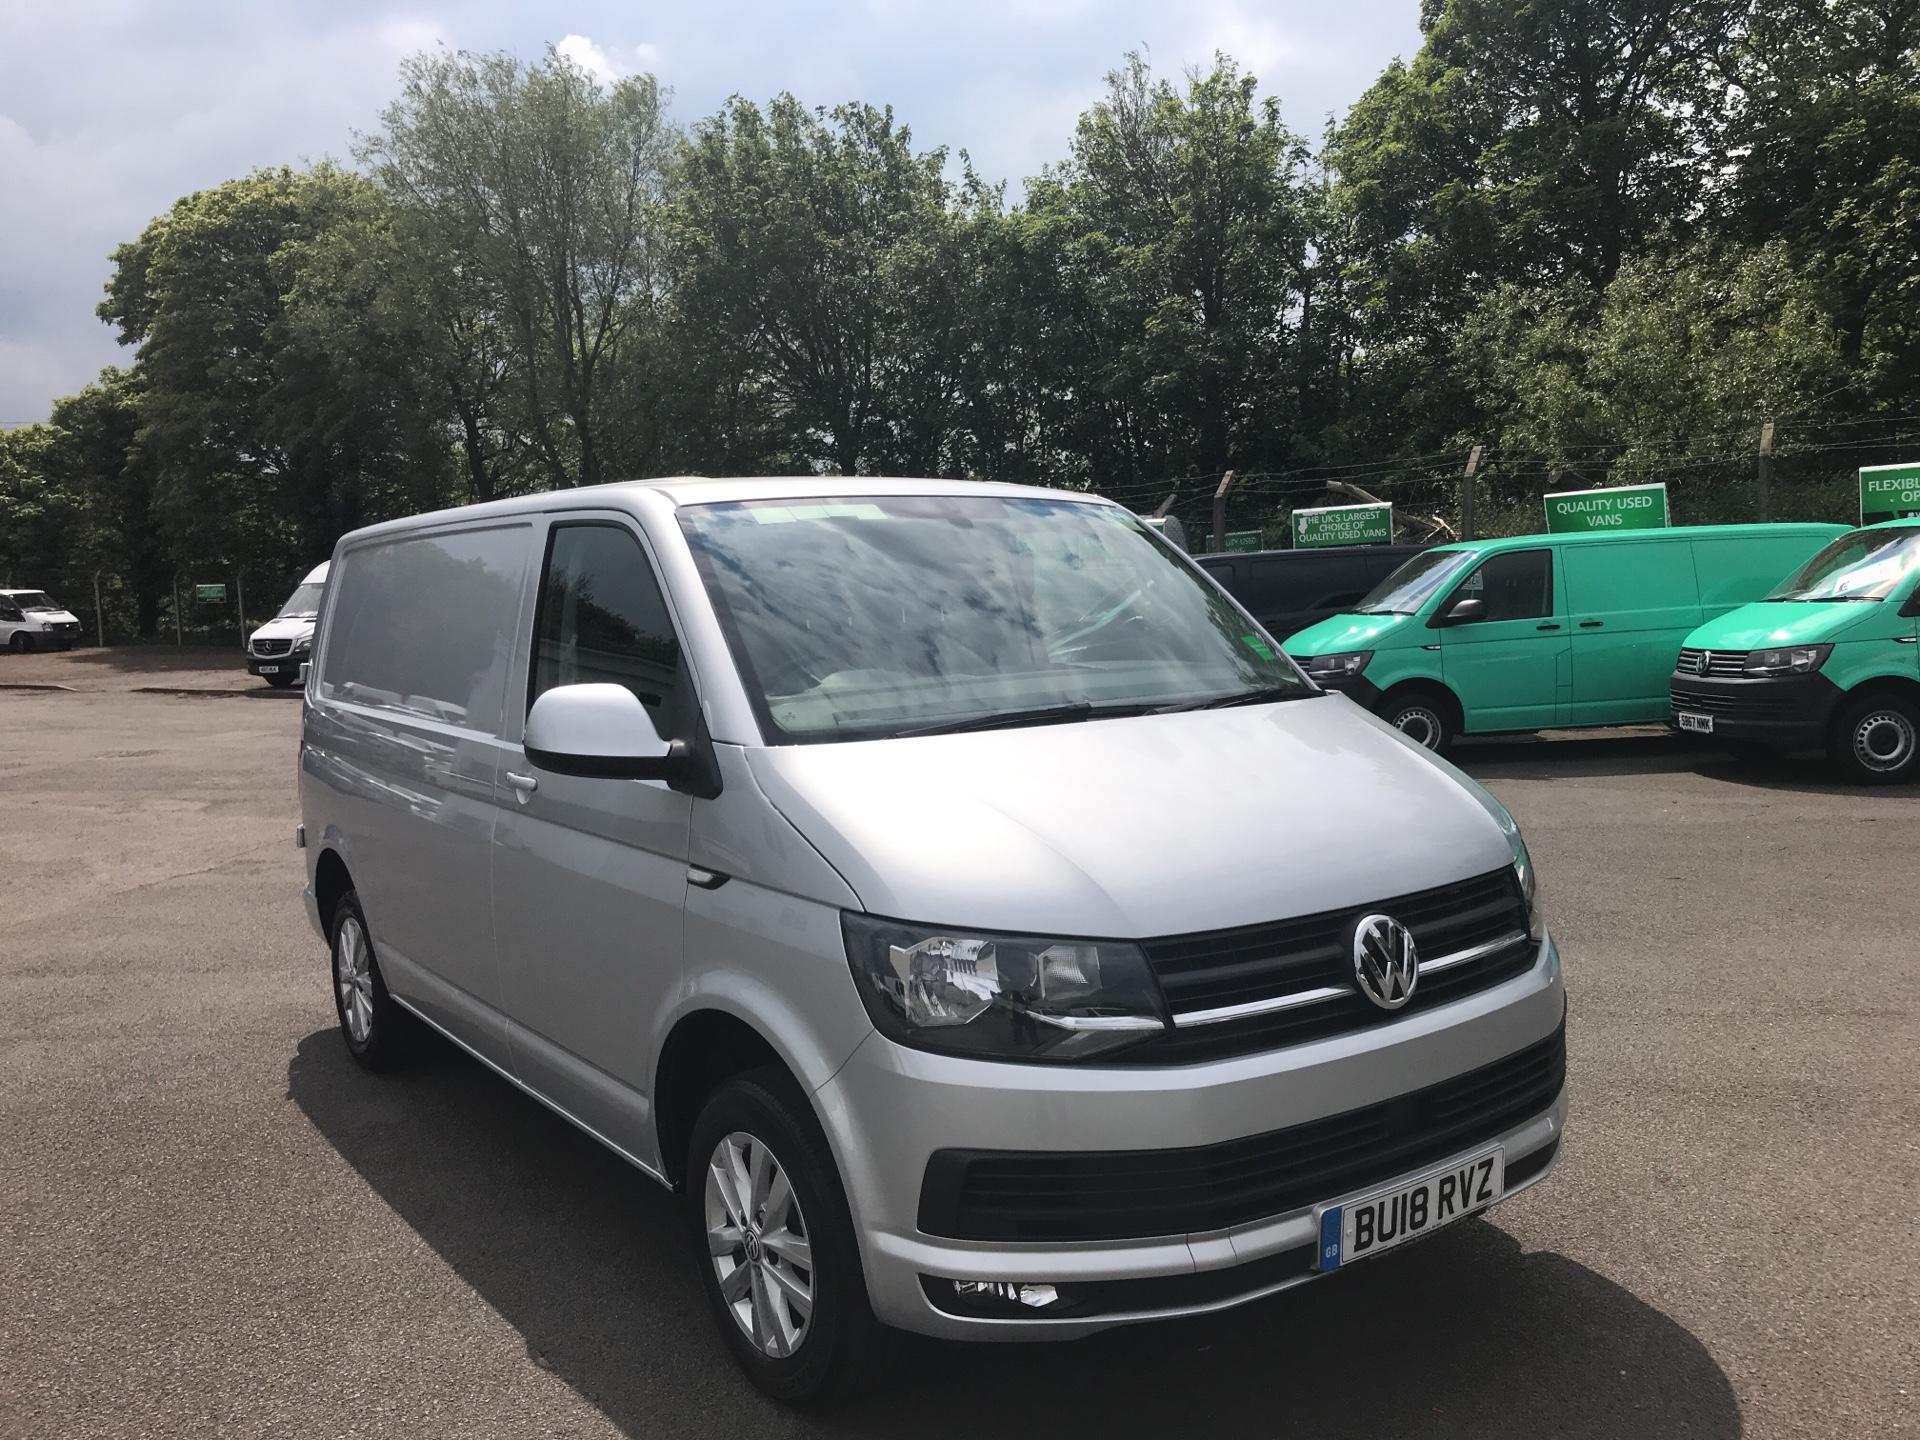 2018 Volkswagen Transporter T28 SWB DIESEL 2.0 TDI BMT 150 HIGHLINE VAN EURO 6 (BU18RVZ)